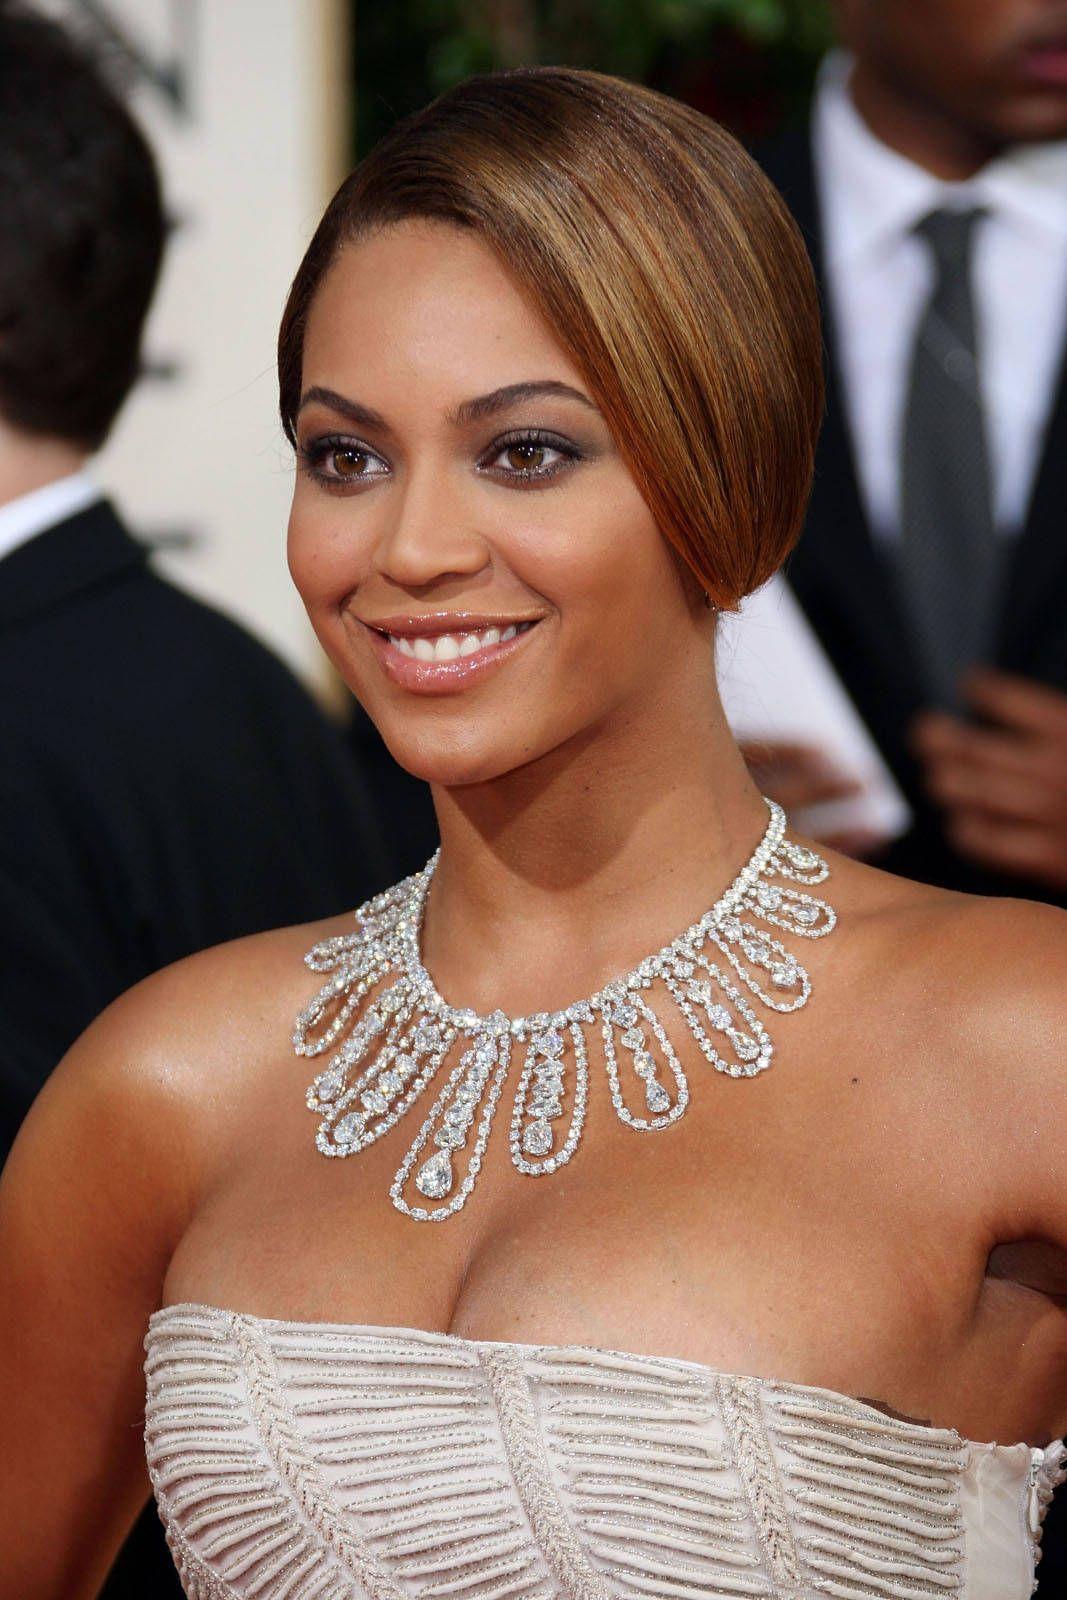 Beyonce beyoncé giselle knowlescarter pinterest updo wedding